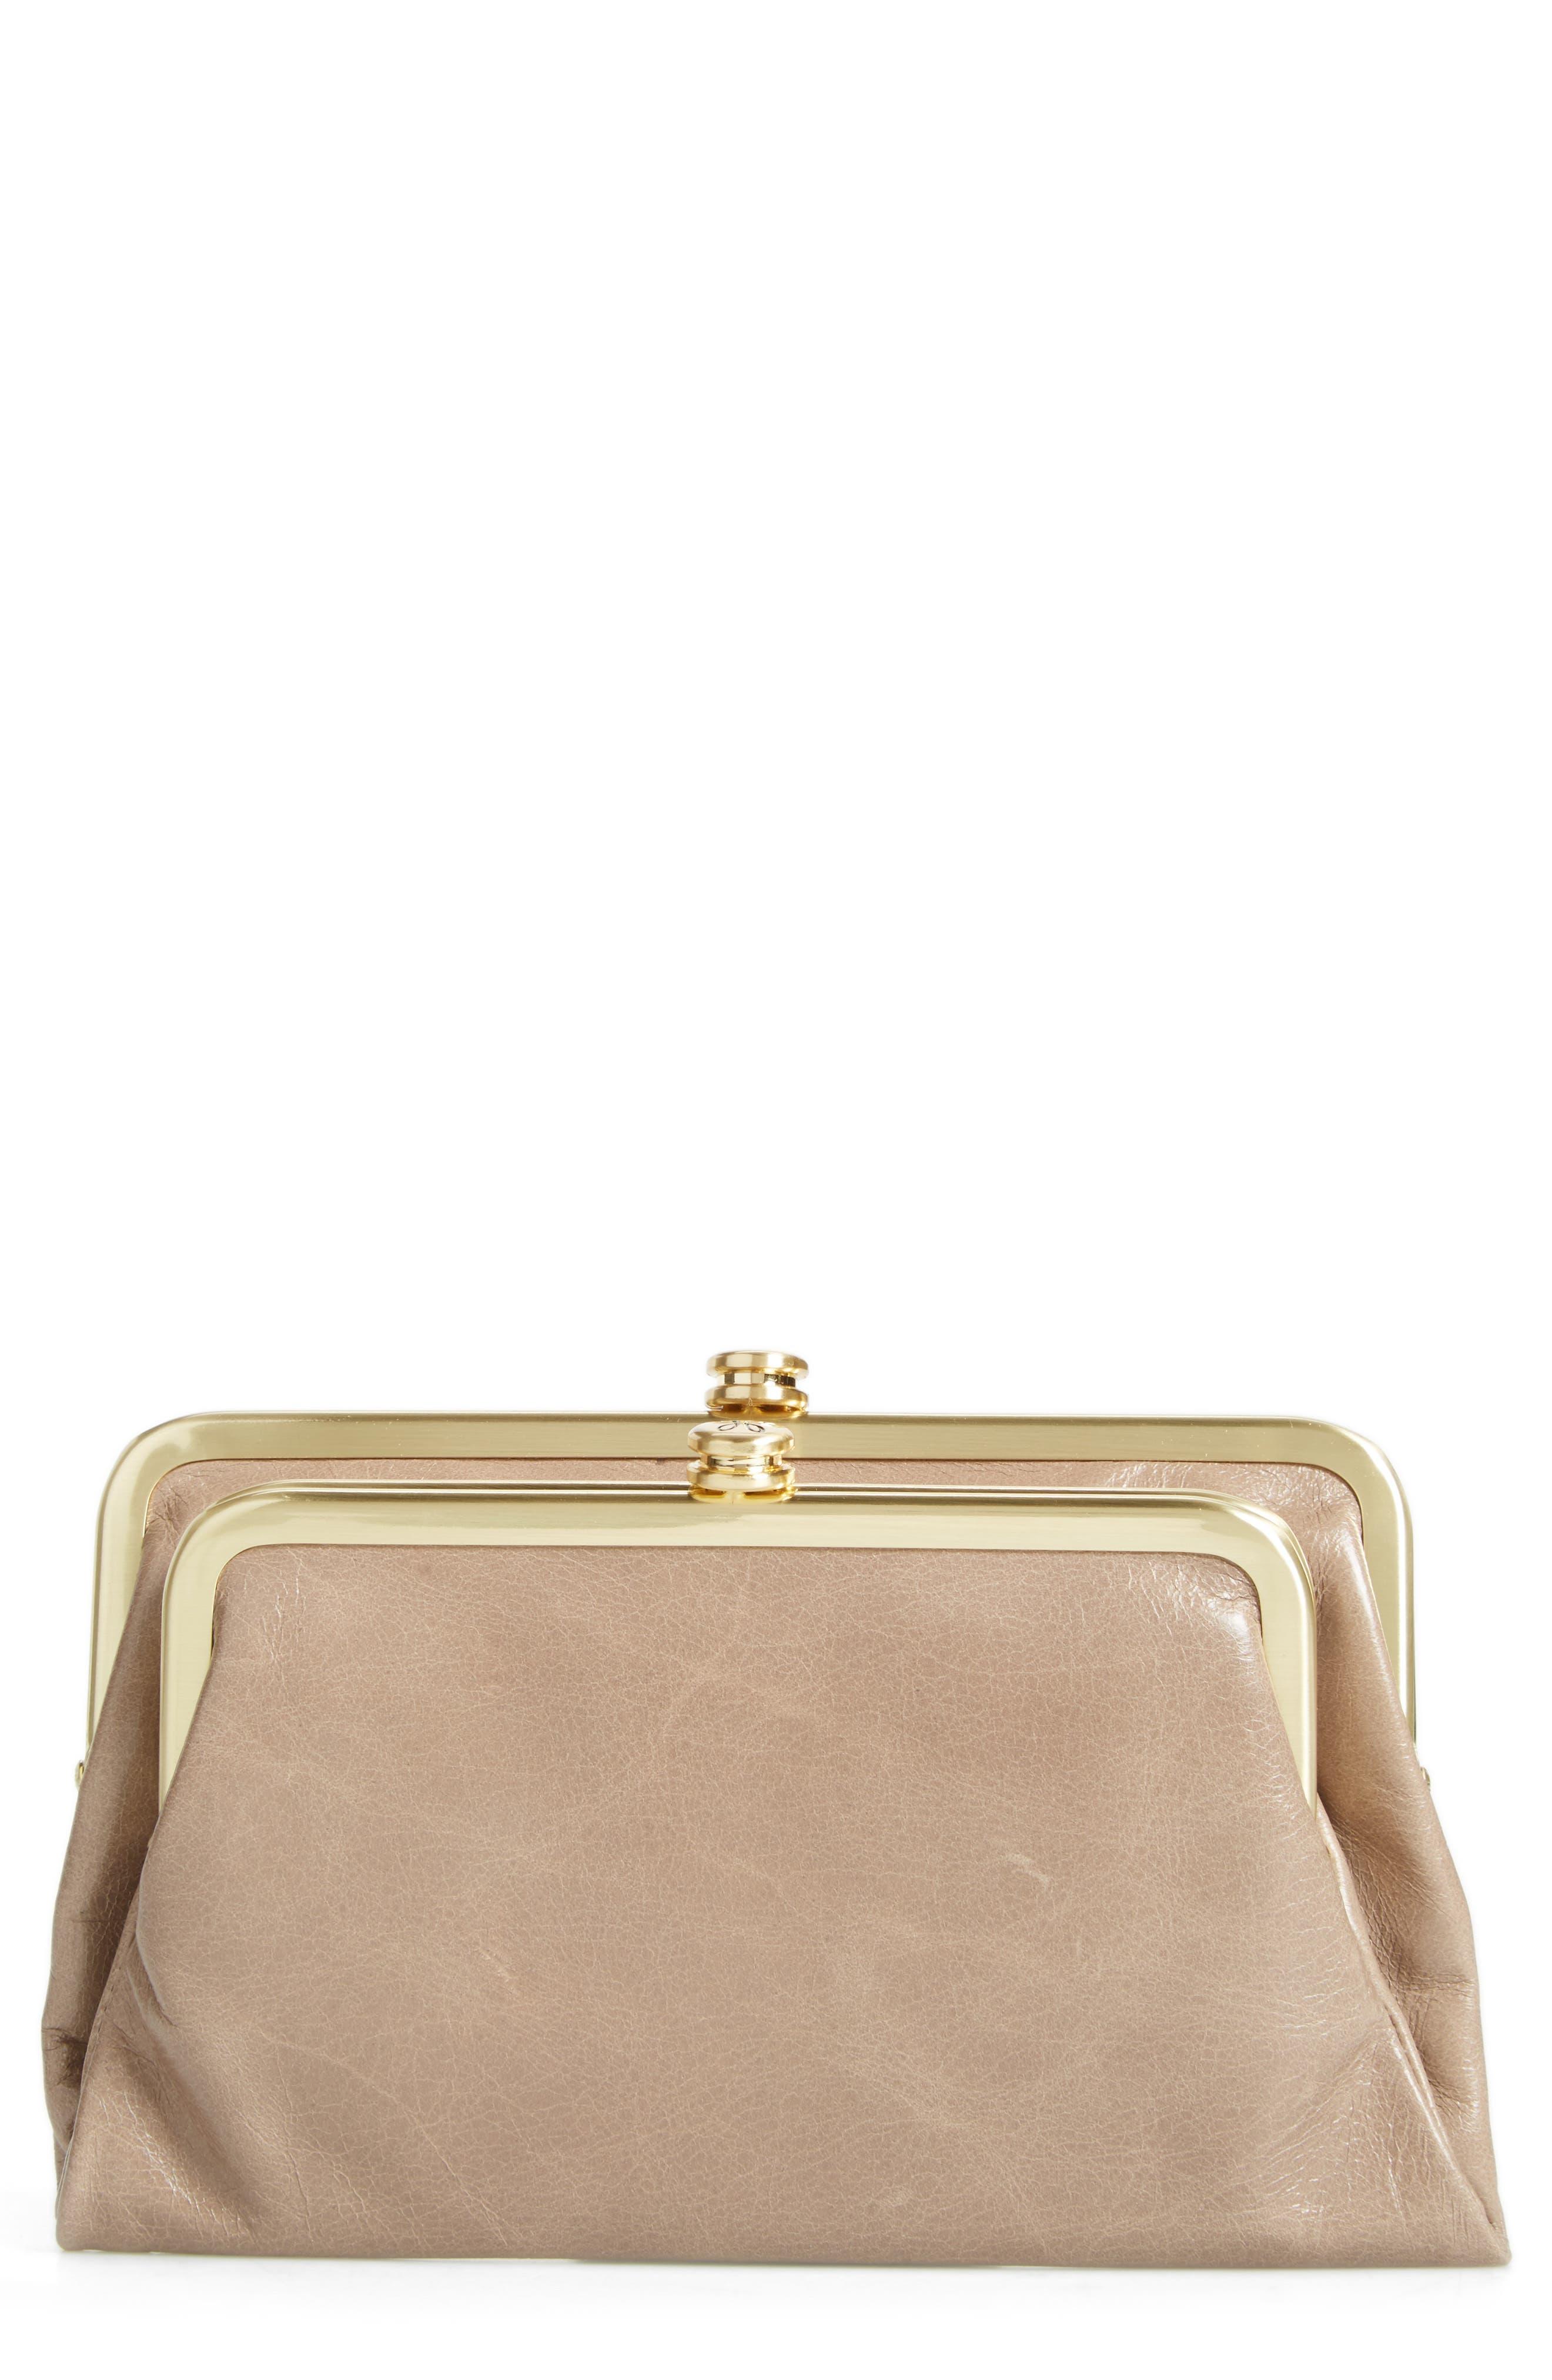 Alternate Image 1 Selected - Hobo Suzette Calfskin Leather Wallet